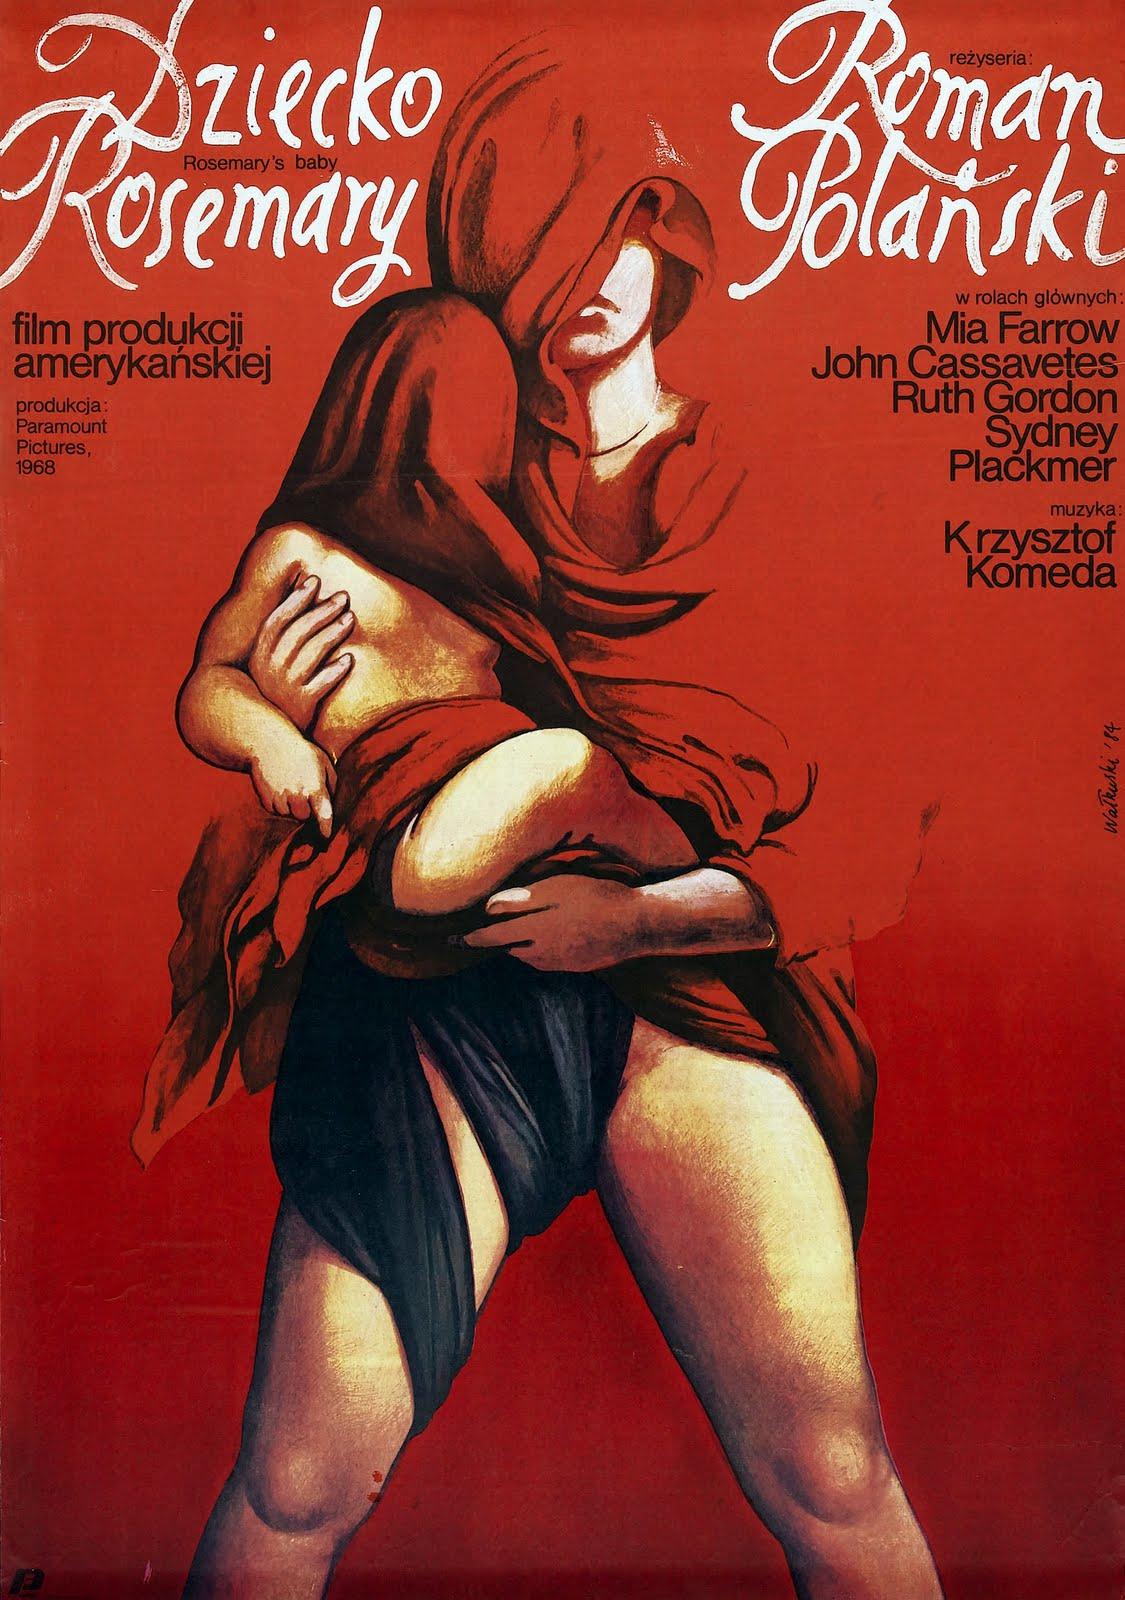 http://1.bp.blogspot.com/-60hHf356QfQ/TqjRFdbZ4OI/AAAAAAAALZo/stmg-Bj96Wo/s1600/Rosemary%2527s+Baby+Polish+Poster.jpg